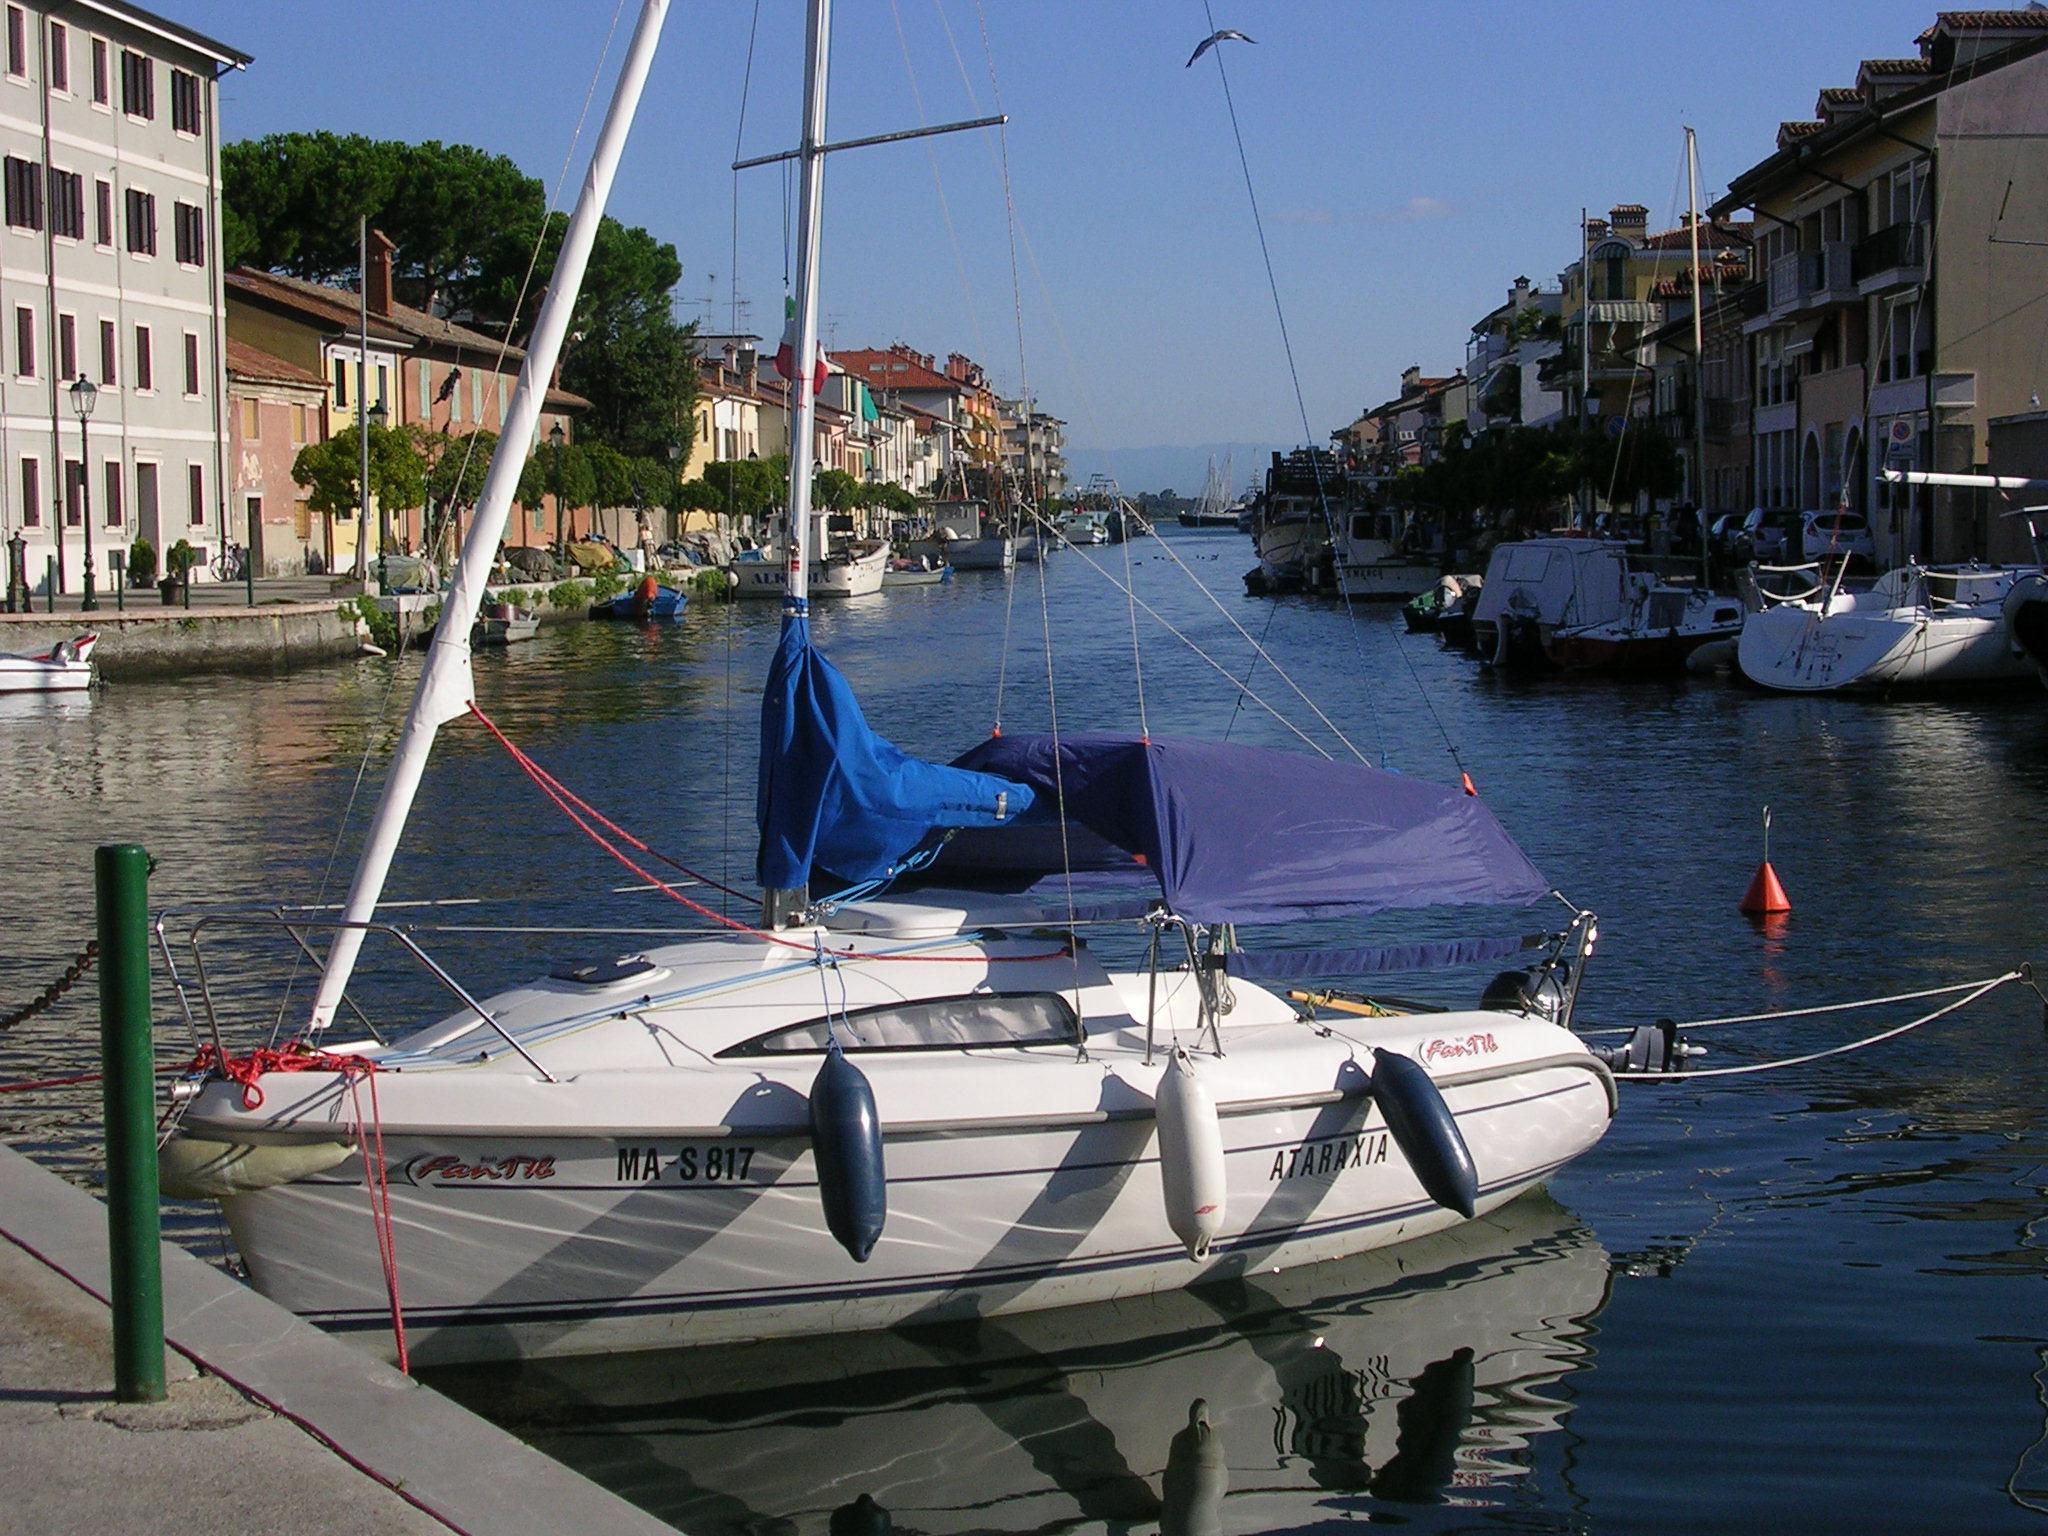 Custom BALT Yacht / Fan 17 Balt